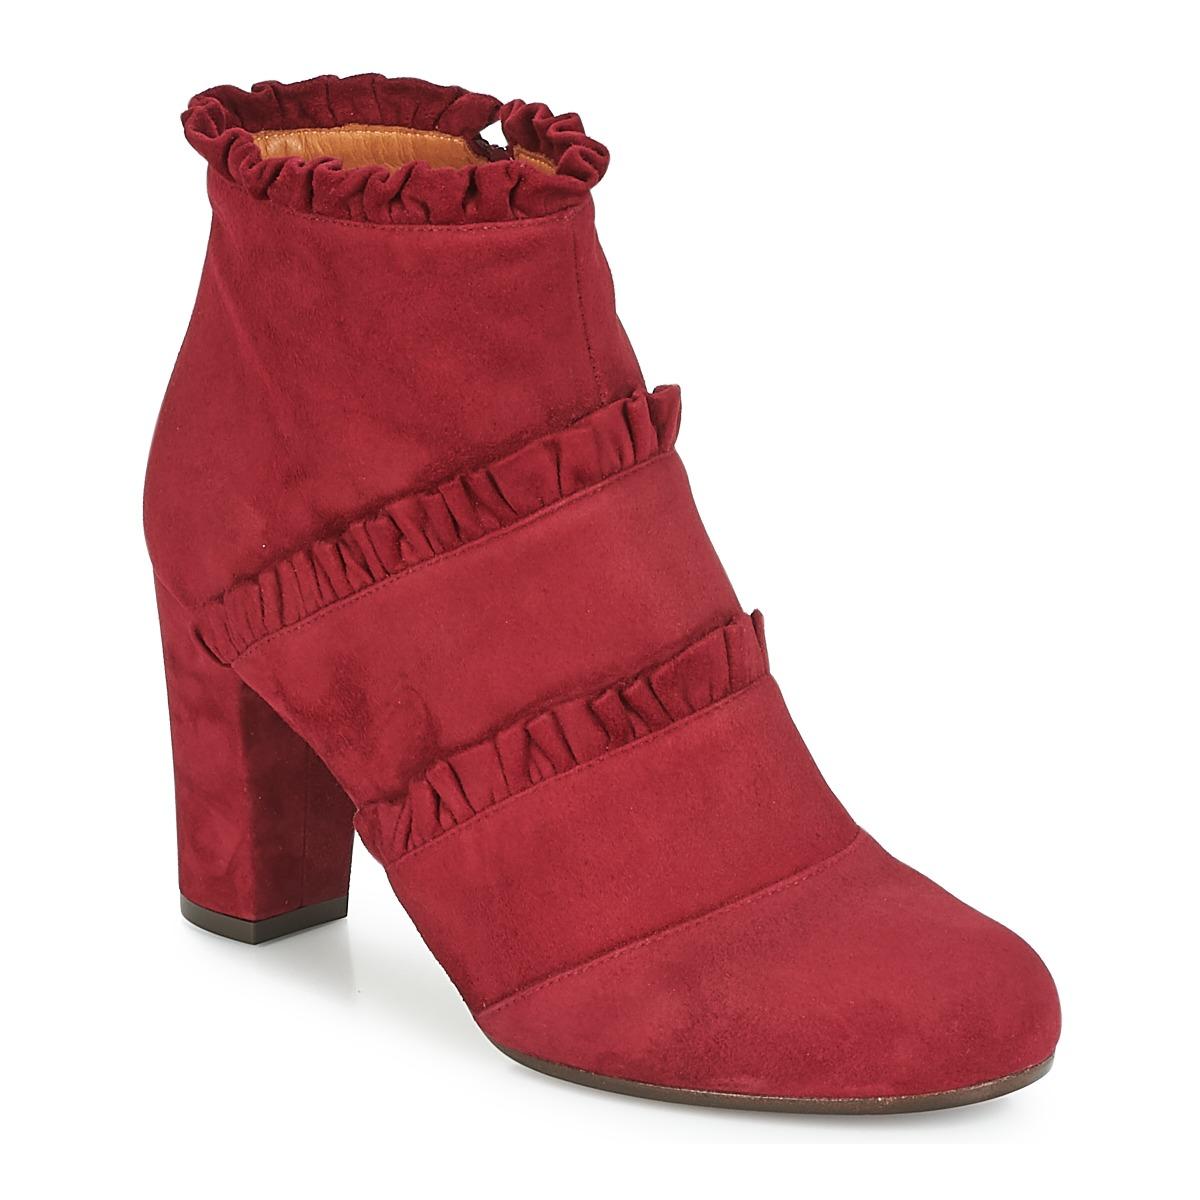 Chie Mihara KAFTAN Bordeaux - Kostenloser Versand bei Spartoode ! - Schuhe Low Boots Damen 363,00 €